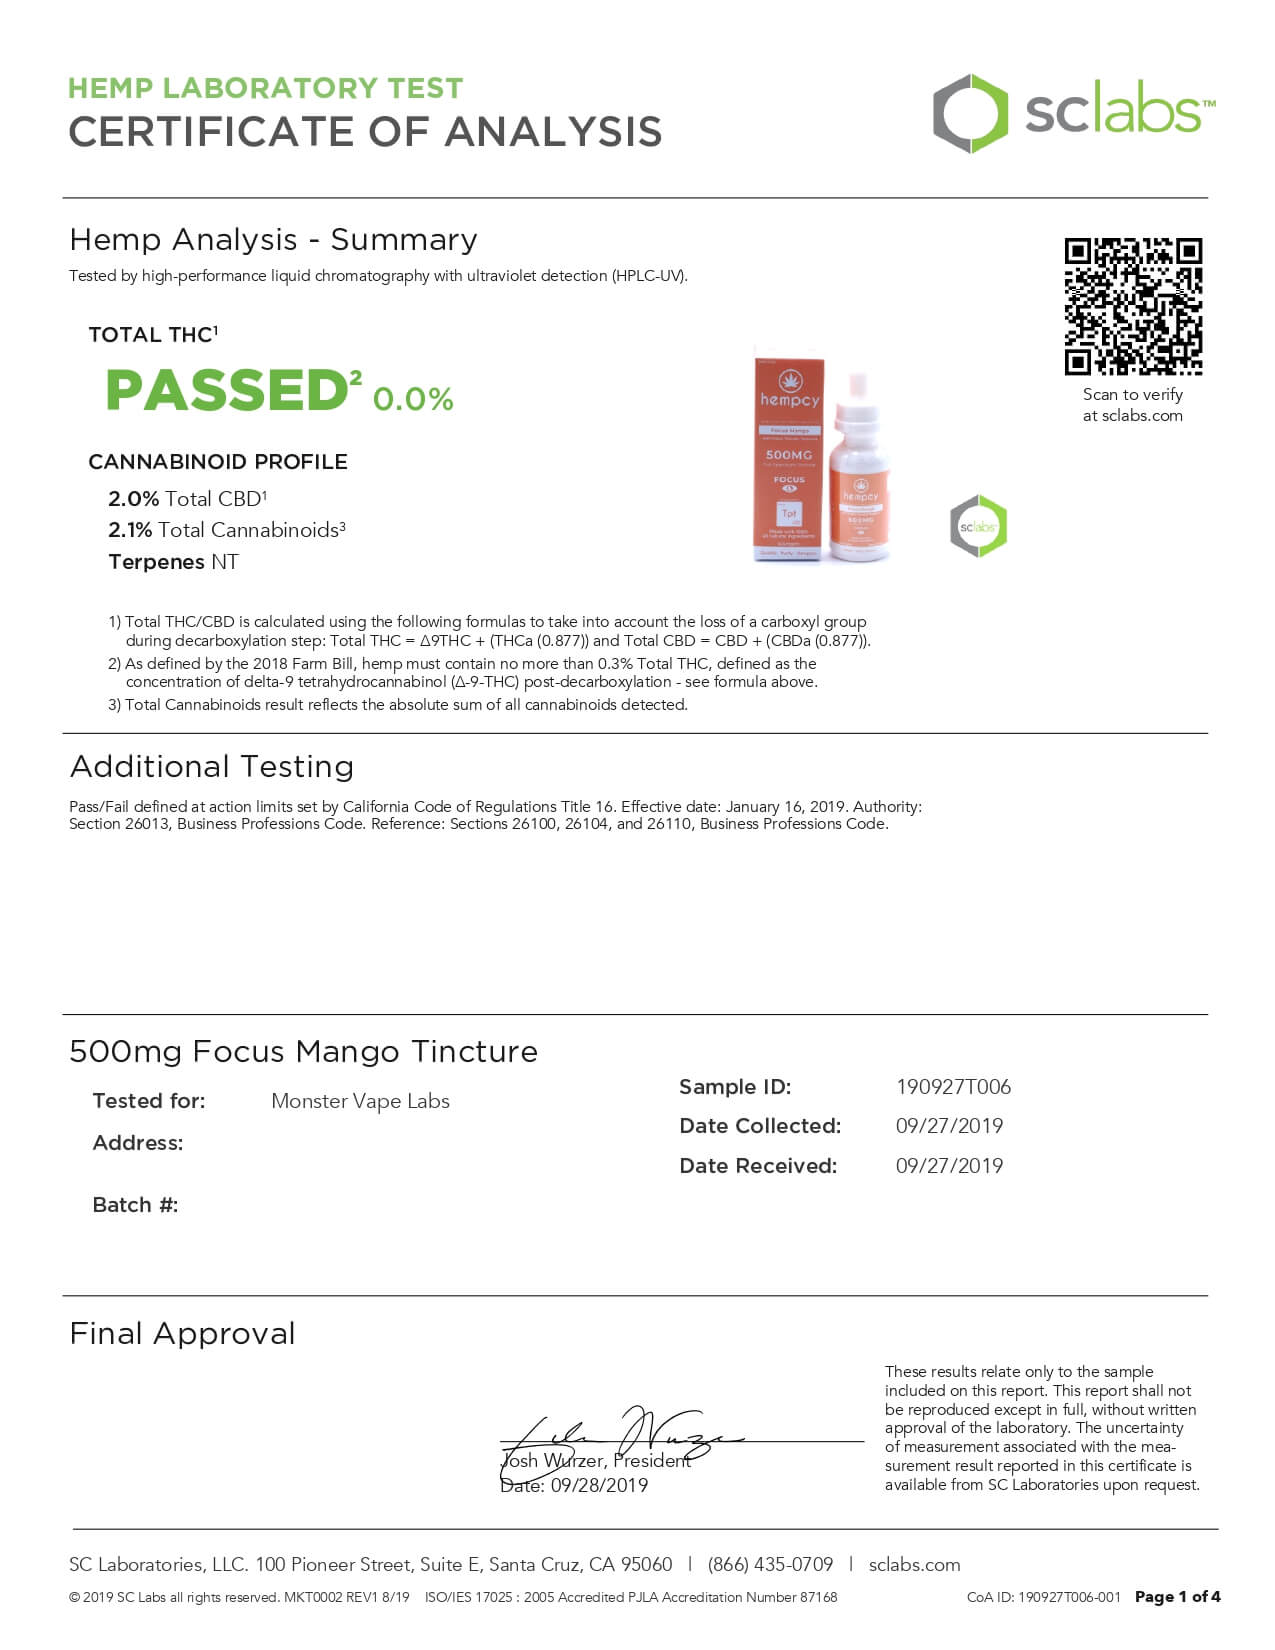 Hempcy CBD Tincture Focus Mango 500mg Lab Report